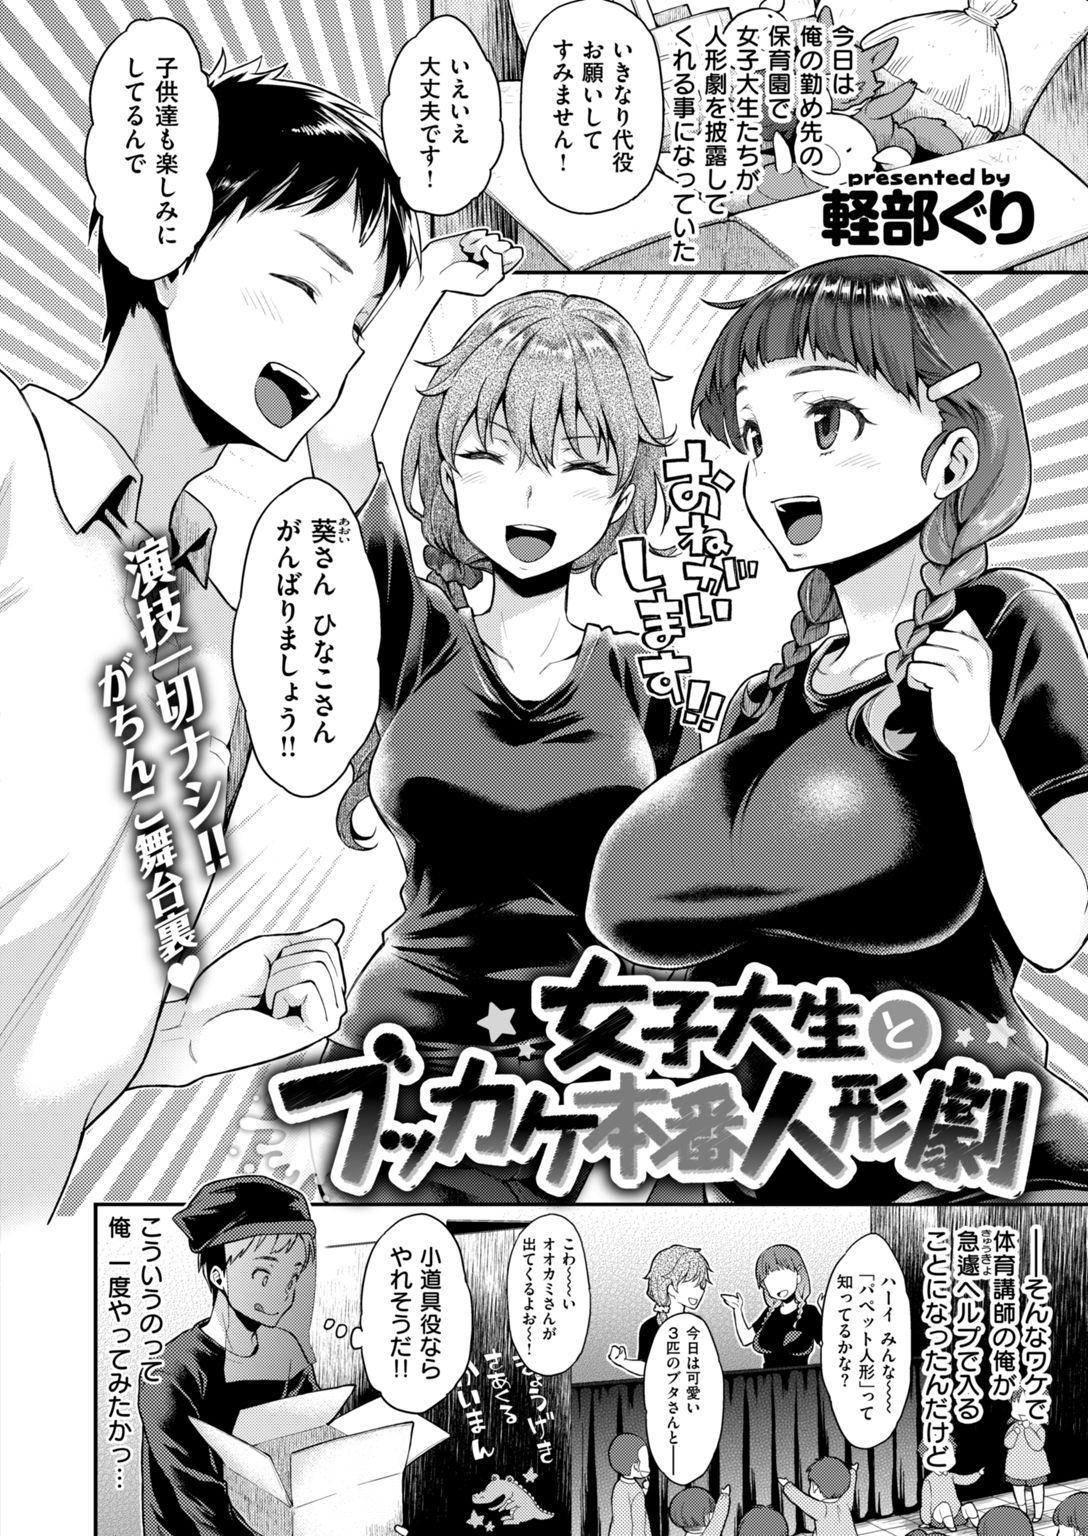 COMIC HAPPINING Vol. 2 48